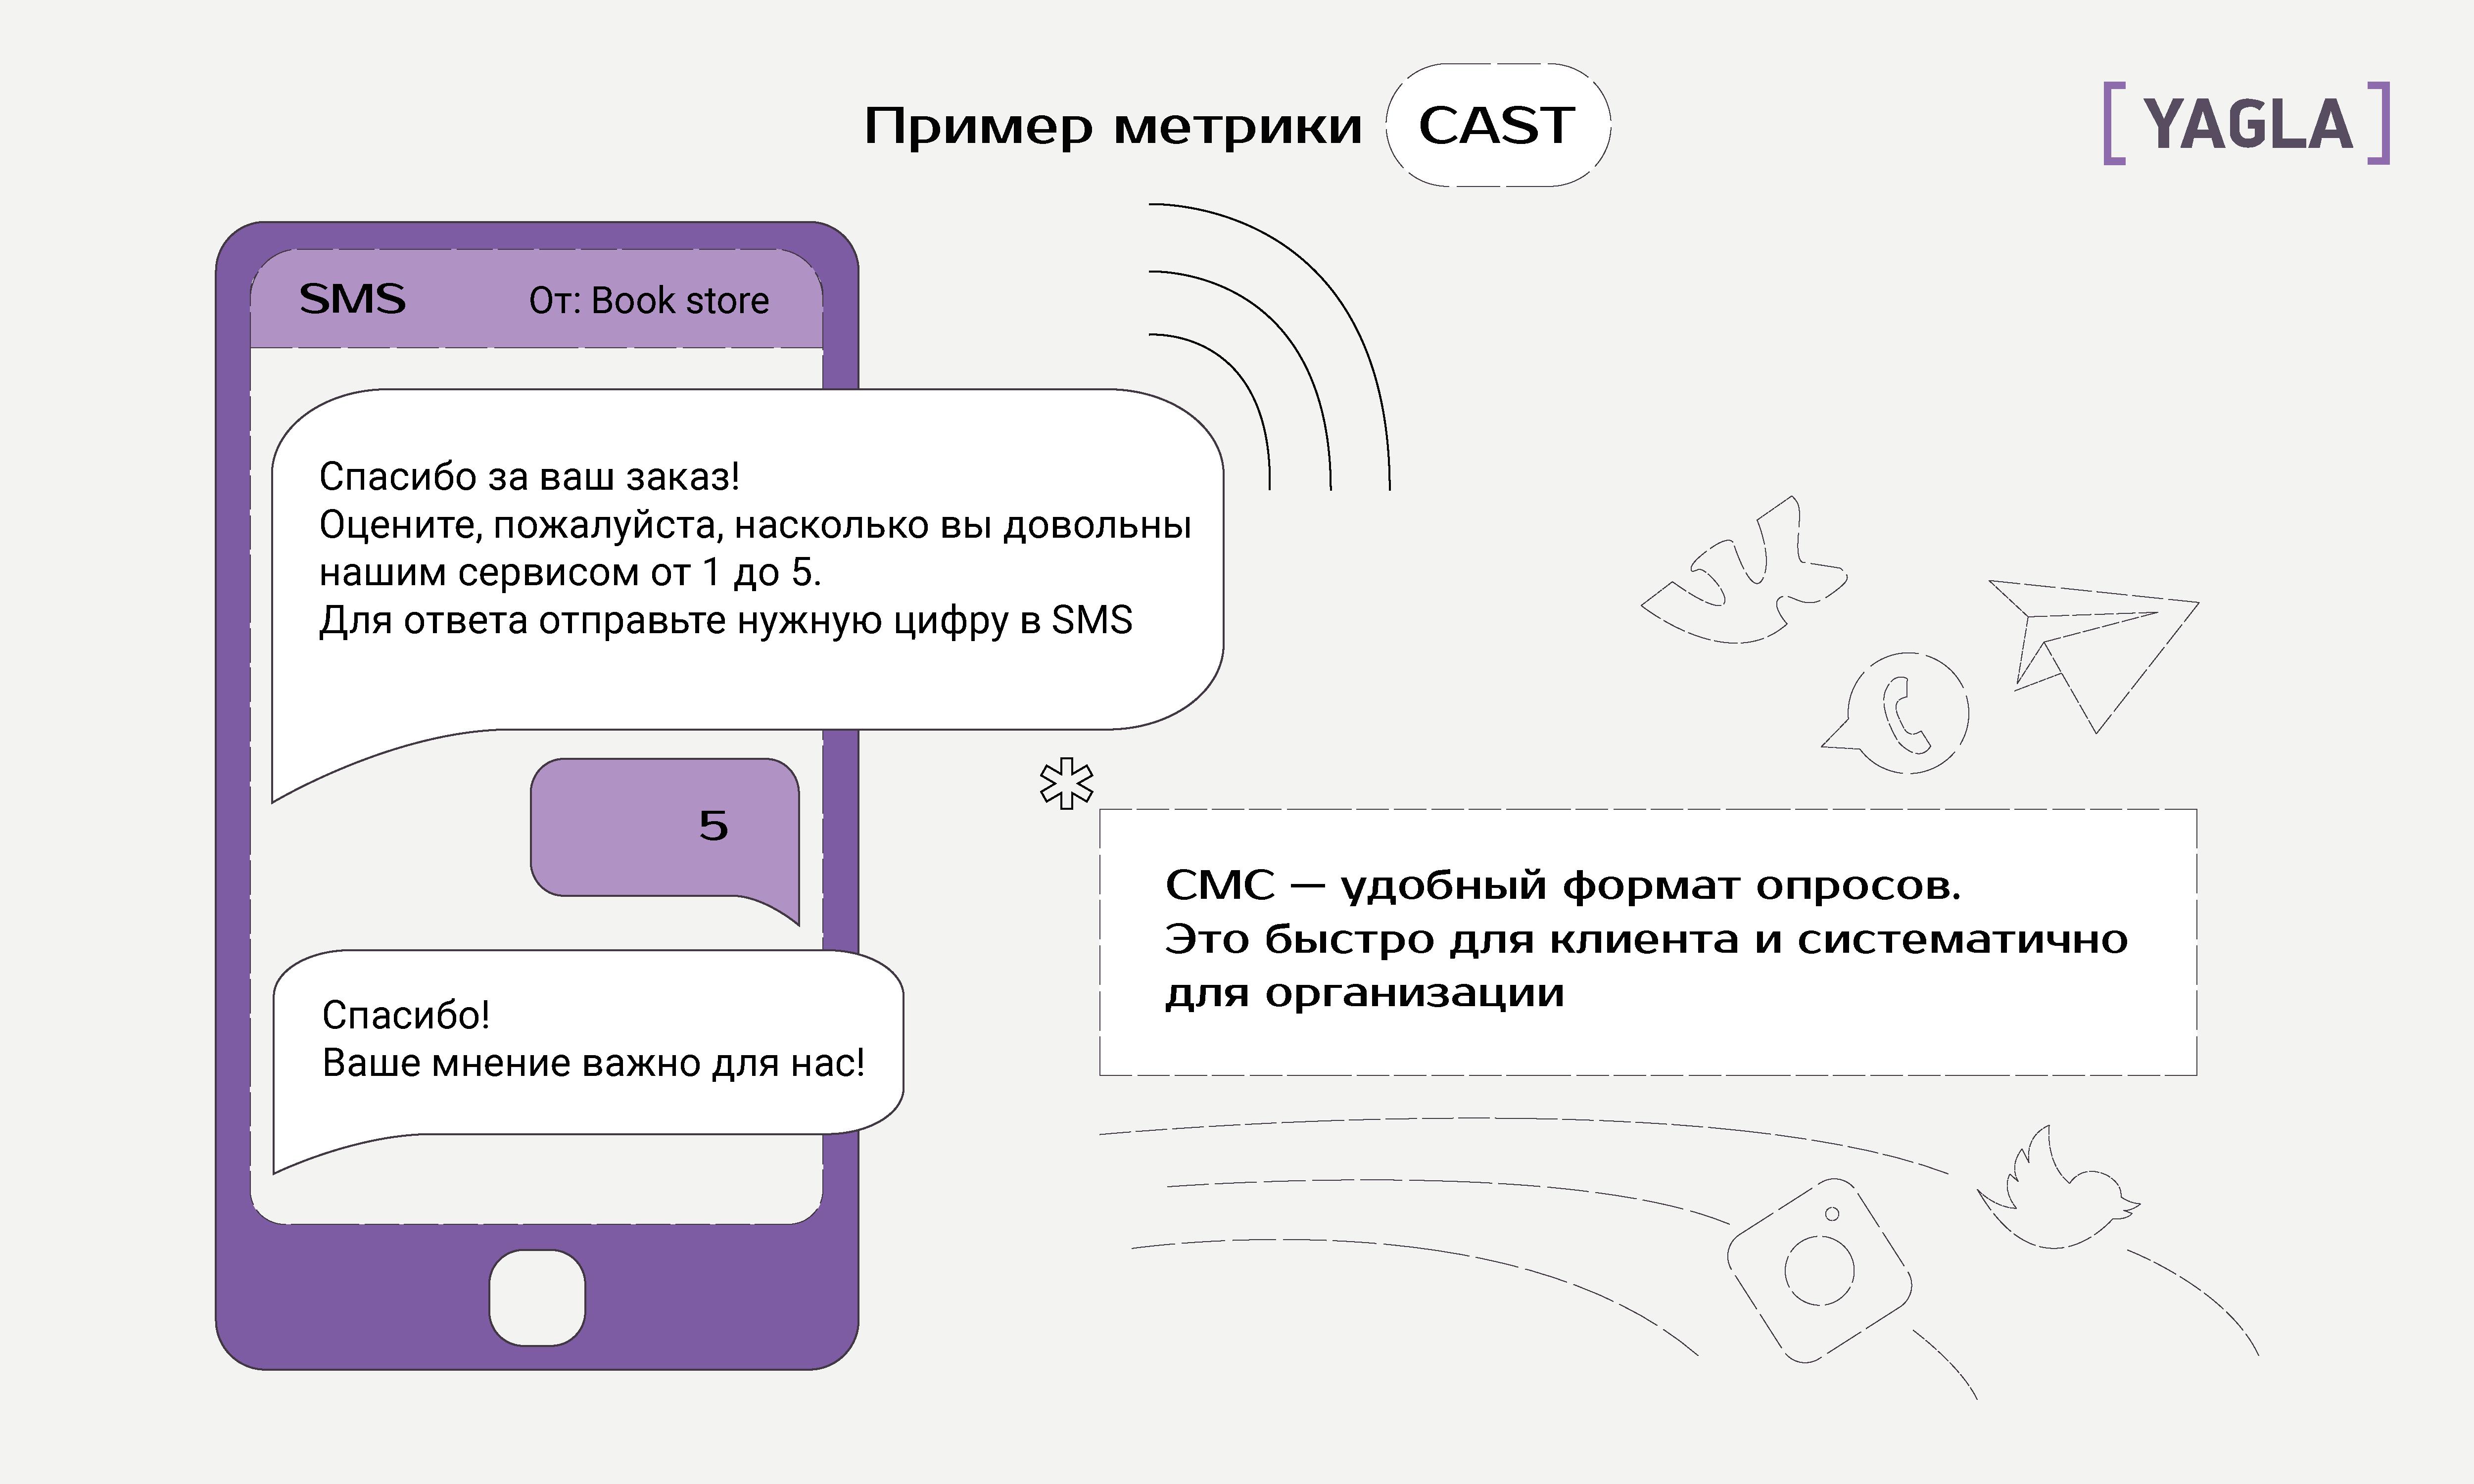 Пример метрики CAST